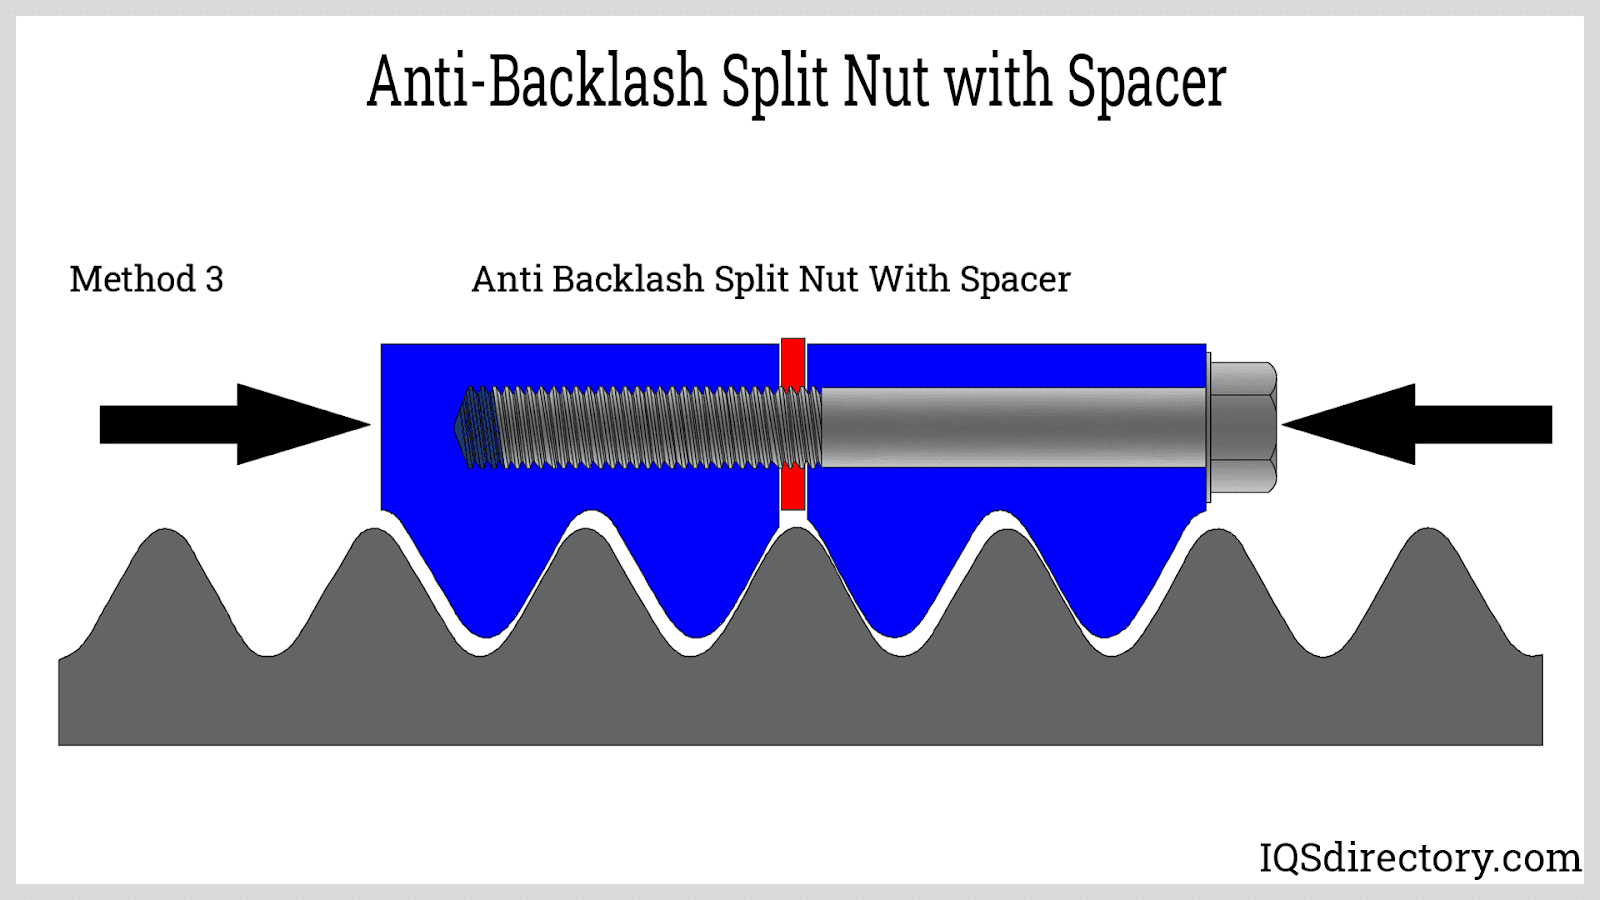 Anti-Backlash Split Nut with Spacer